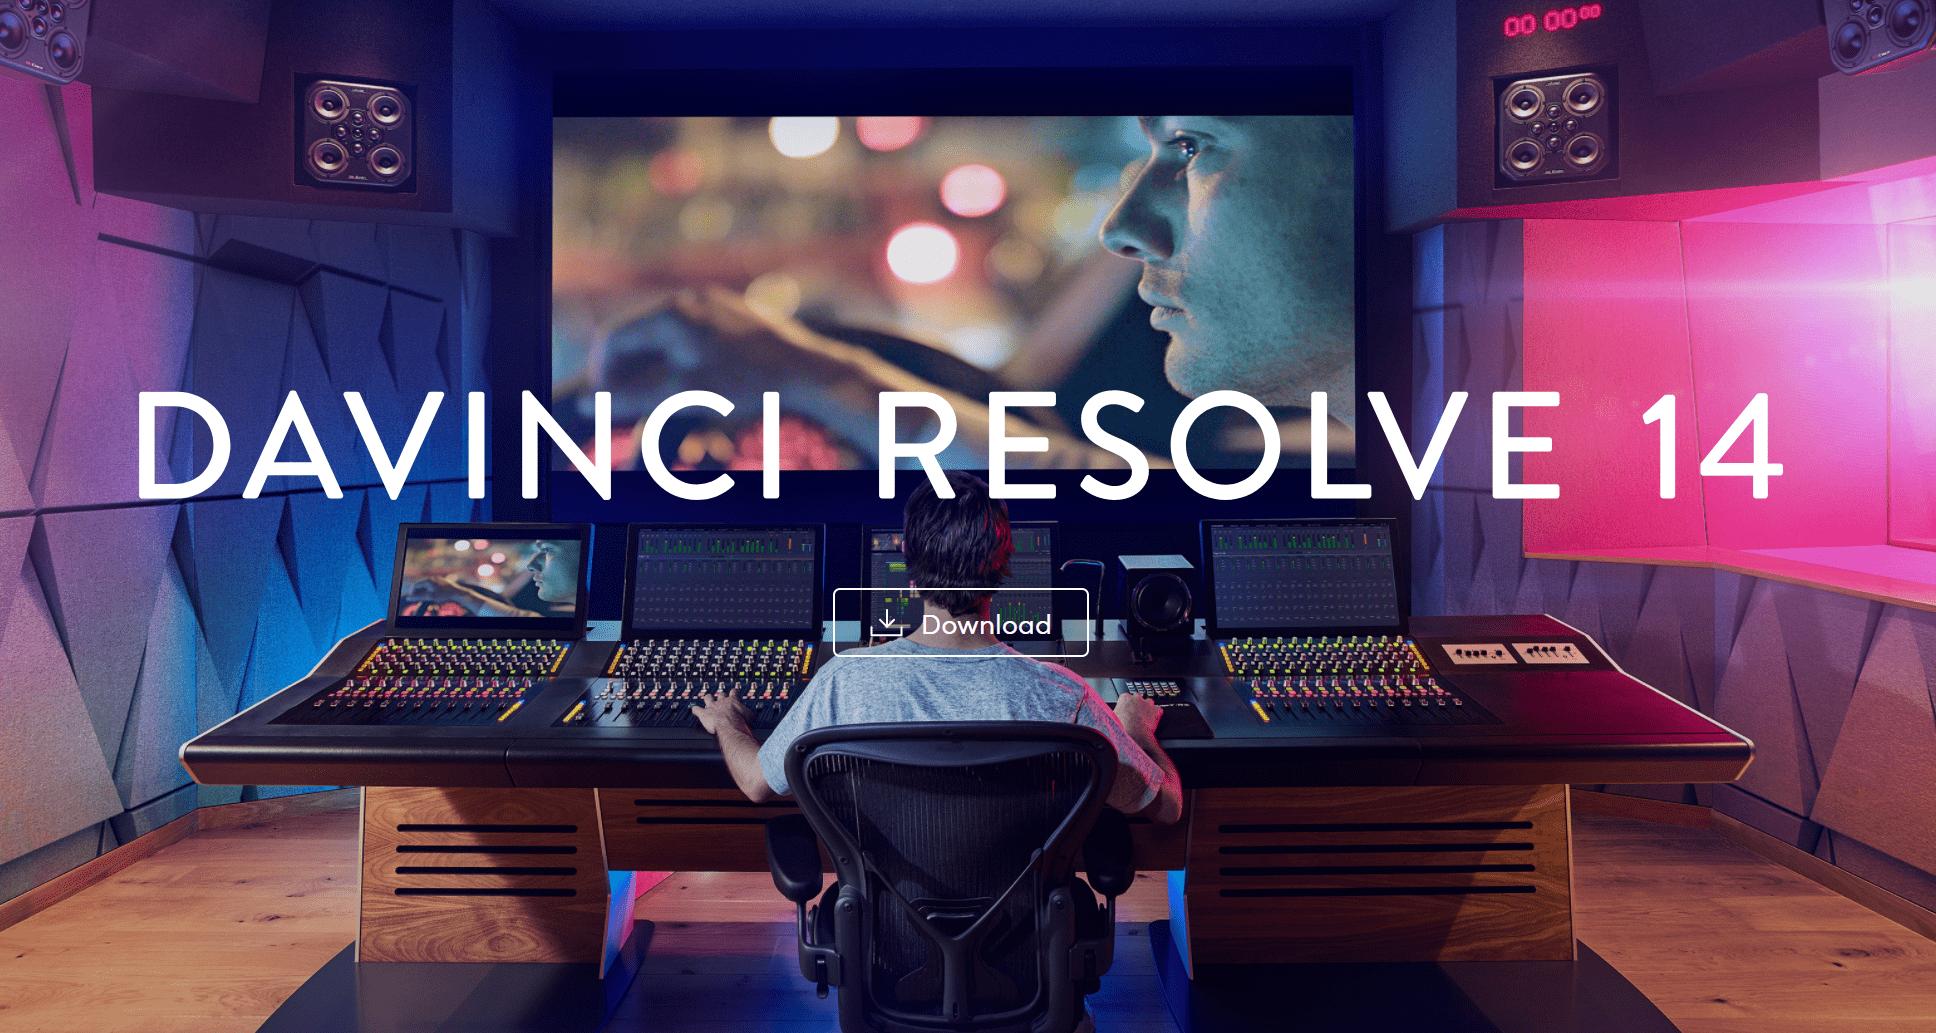 DaVinci Resolve videobewerking programma voor 2018